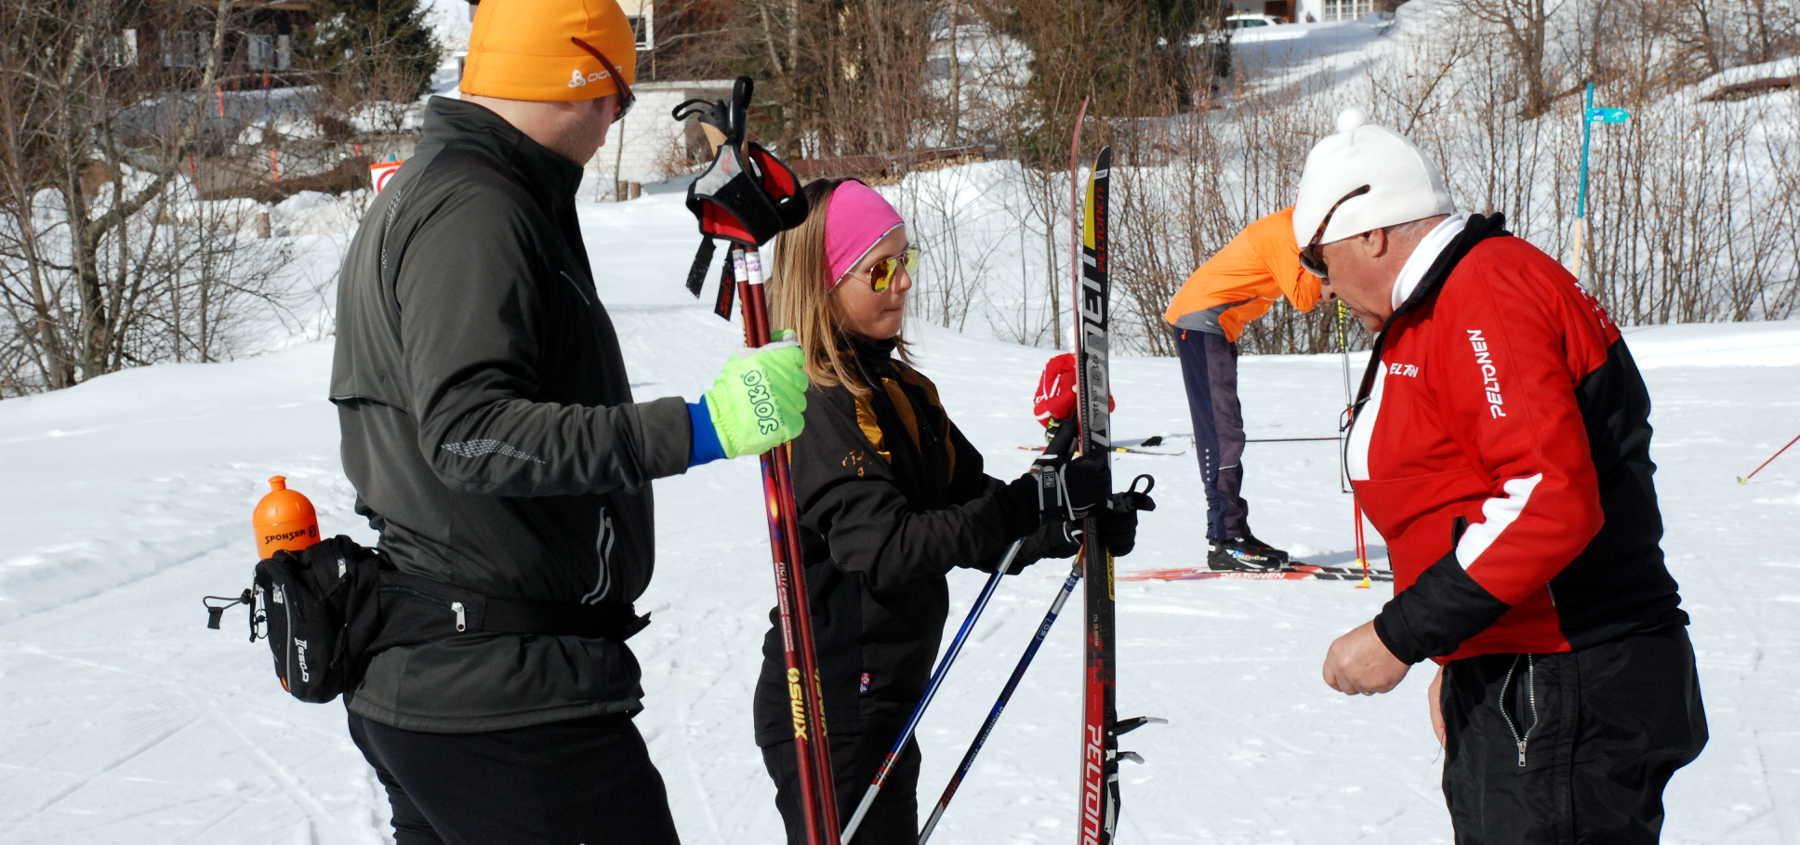 skitest11800x845-50